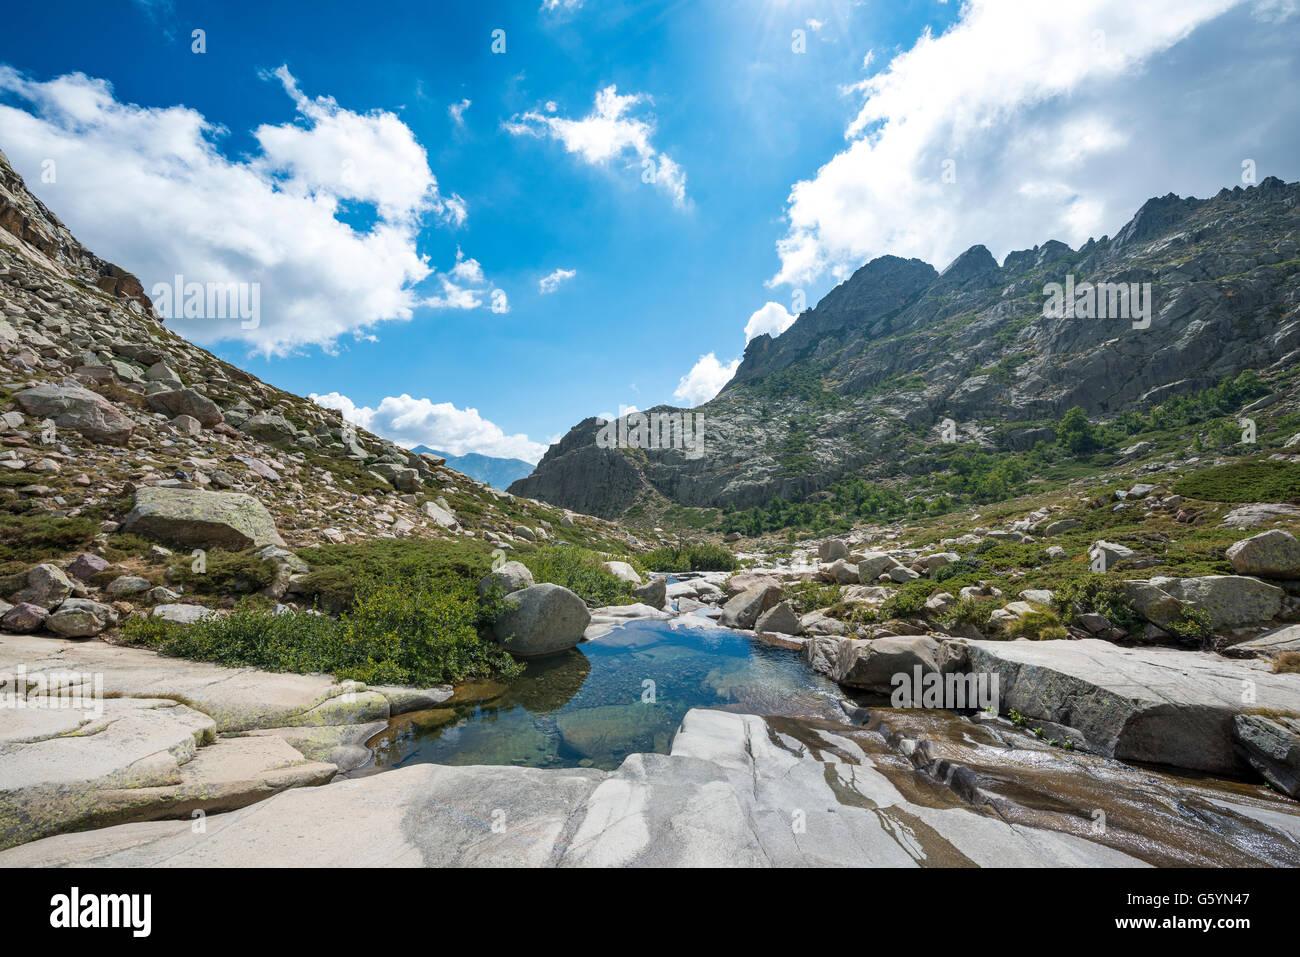 Pool in the mountains, river Golo, Nature Park of Corsica, Parc naturel régional de Corse, Corsica, France Stock Photo